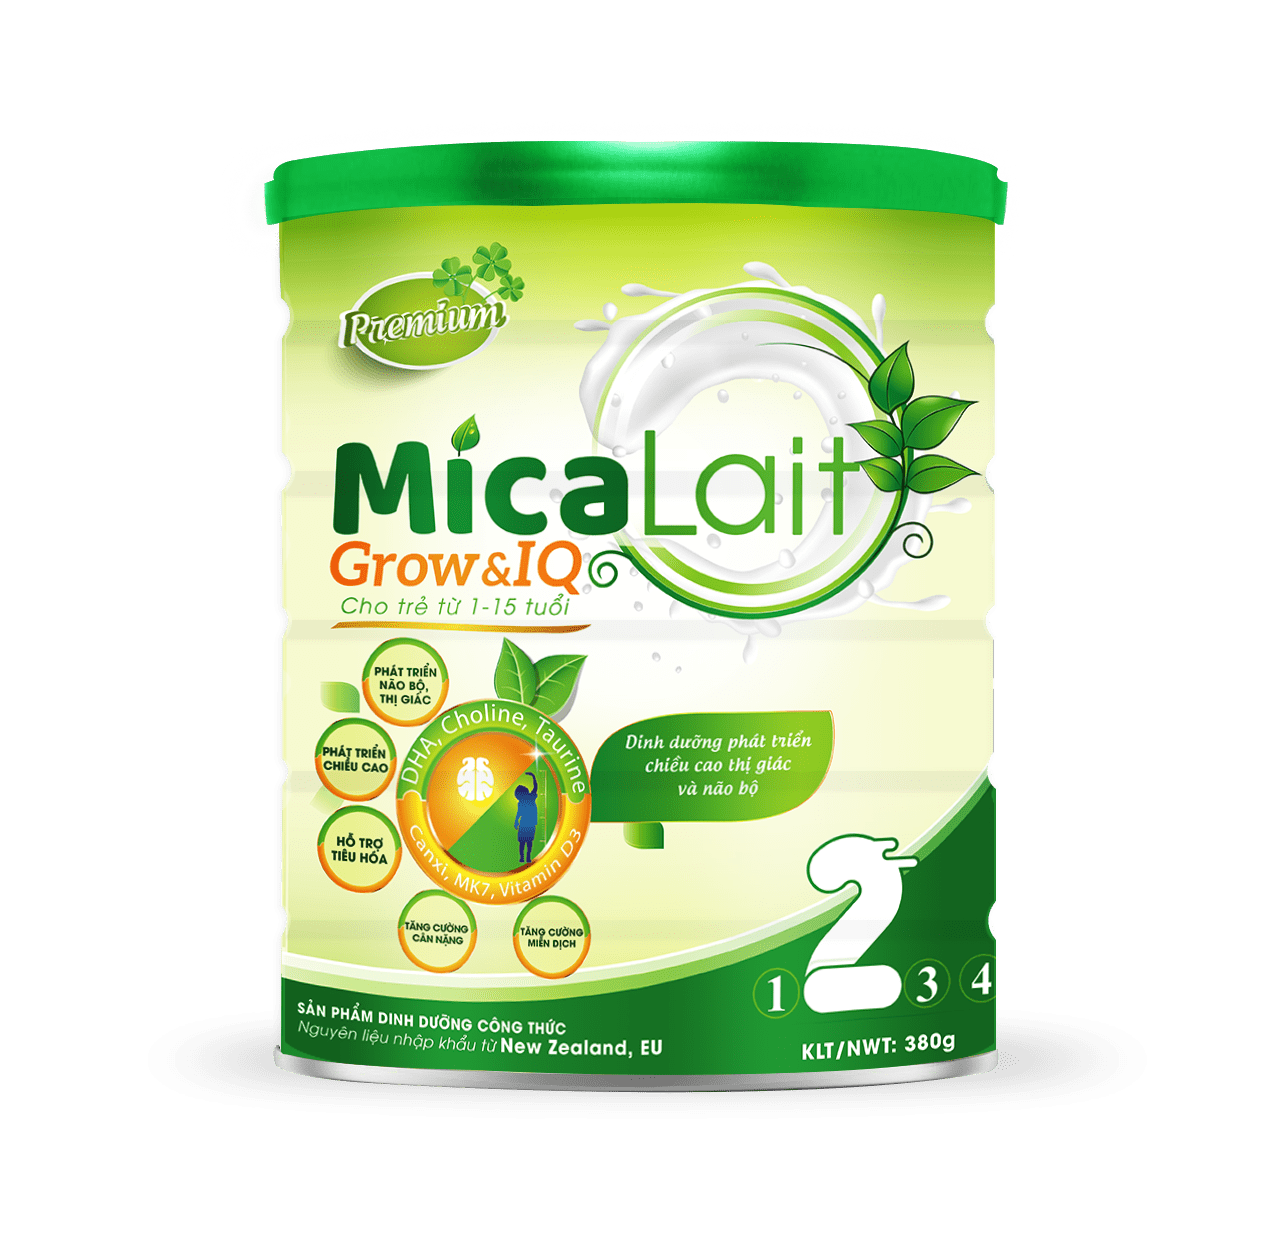 Sữa Micalait Grow & IQ